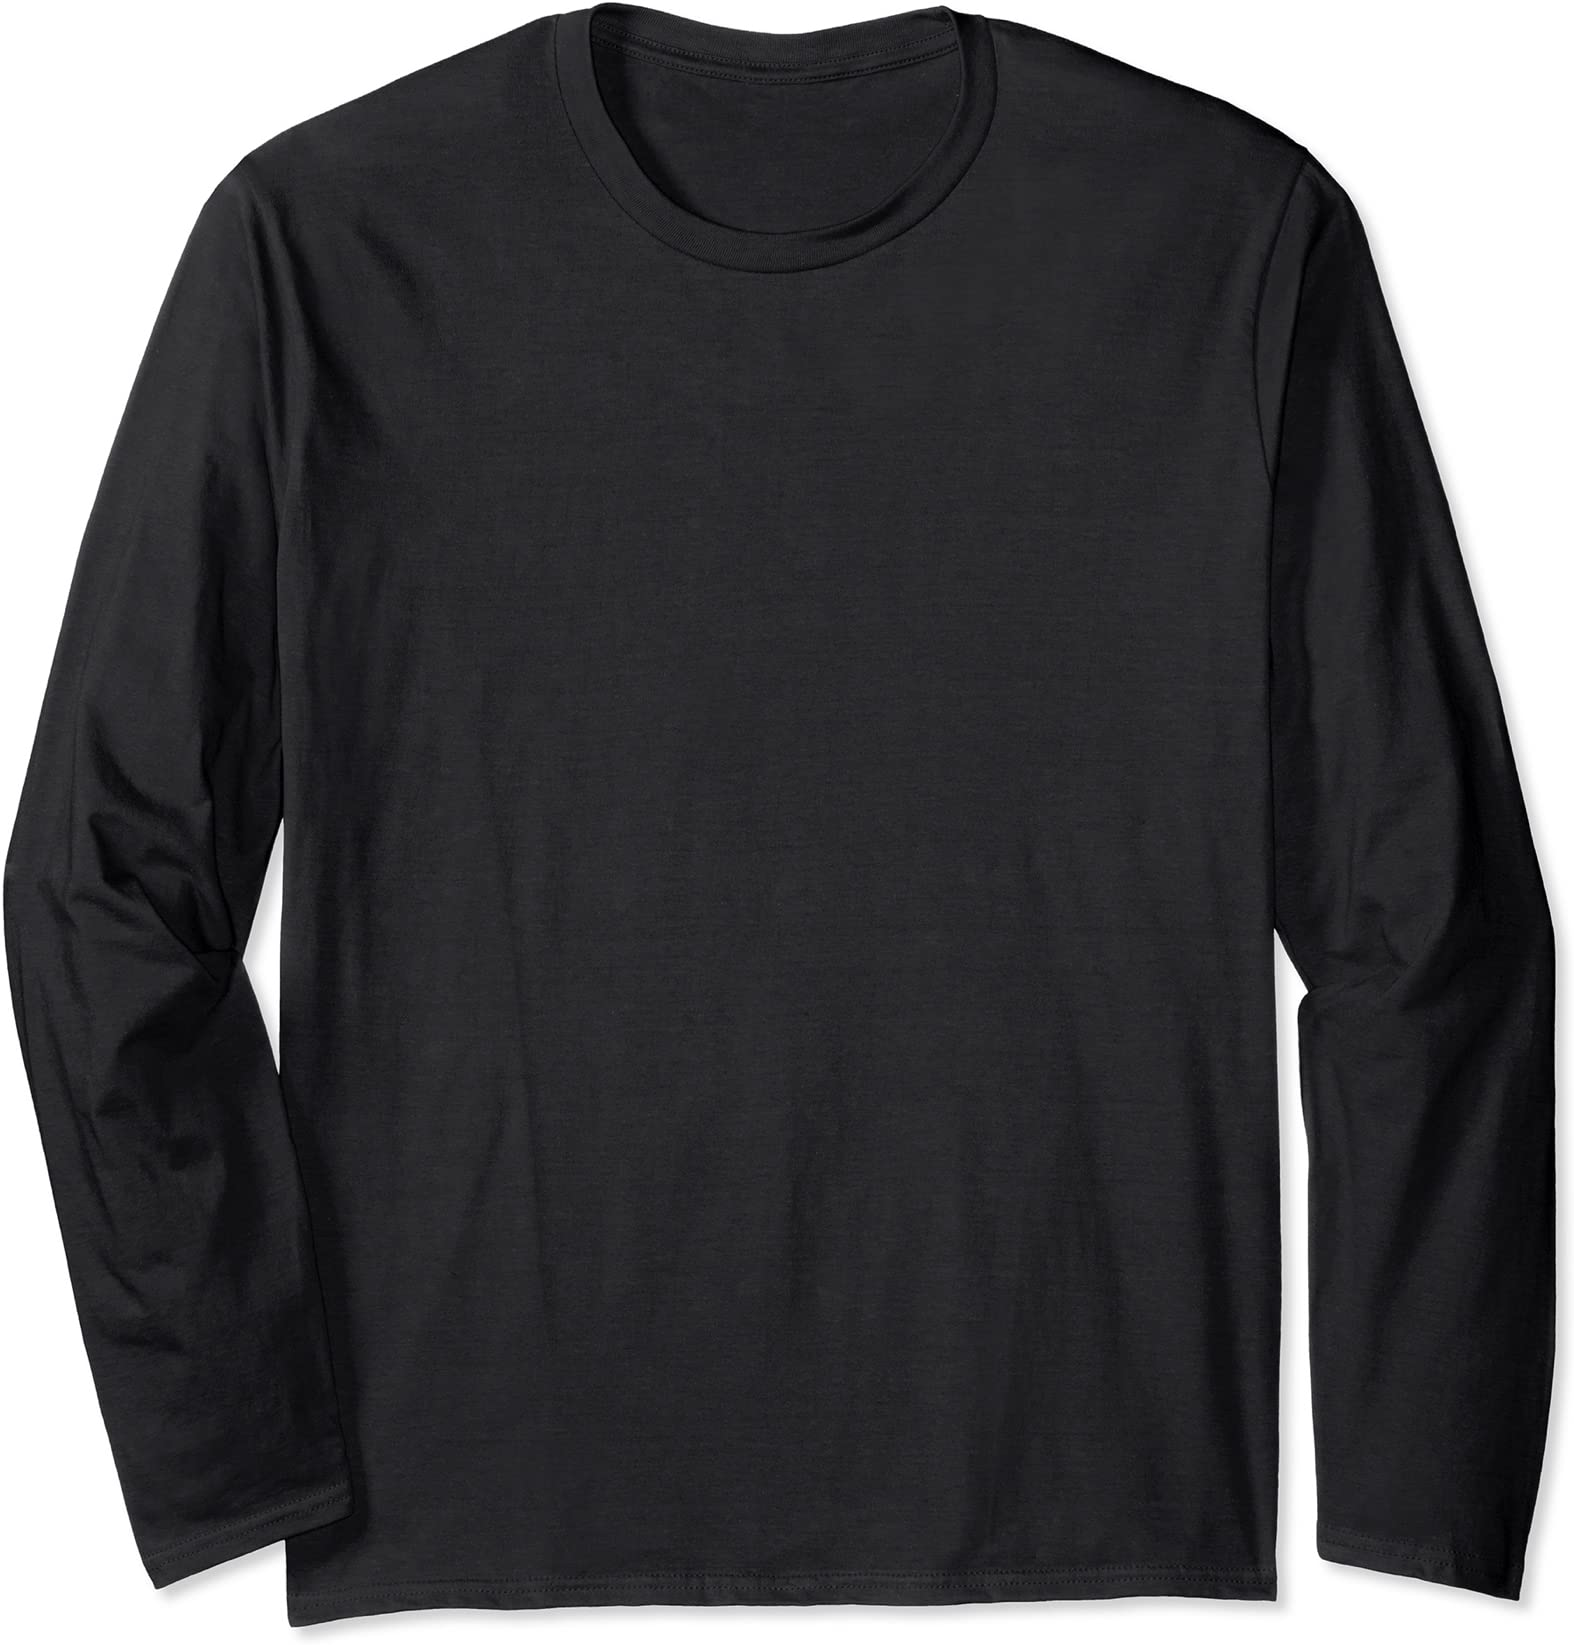 Short Sleeves Shirt Sweatshirt For Mens Womens Ladies Kids. TACO TUESDAY Every now /& then I fall apart funny taco shirt Unisex Hoodie